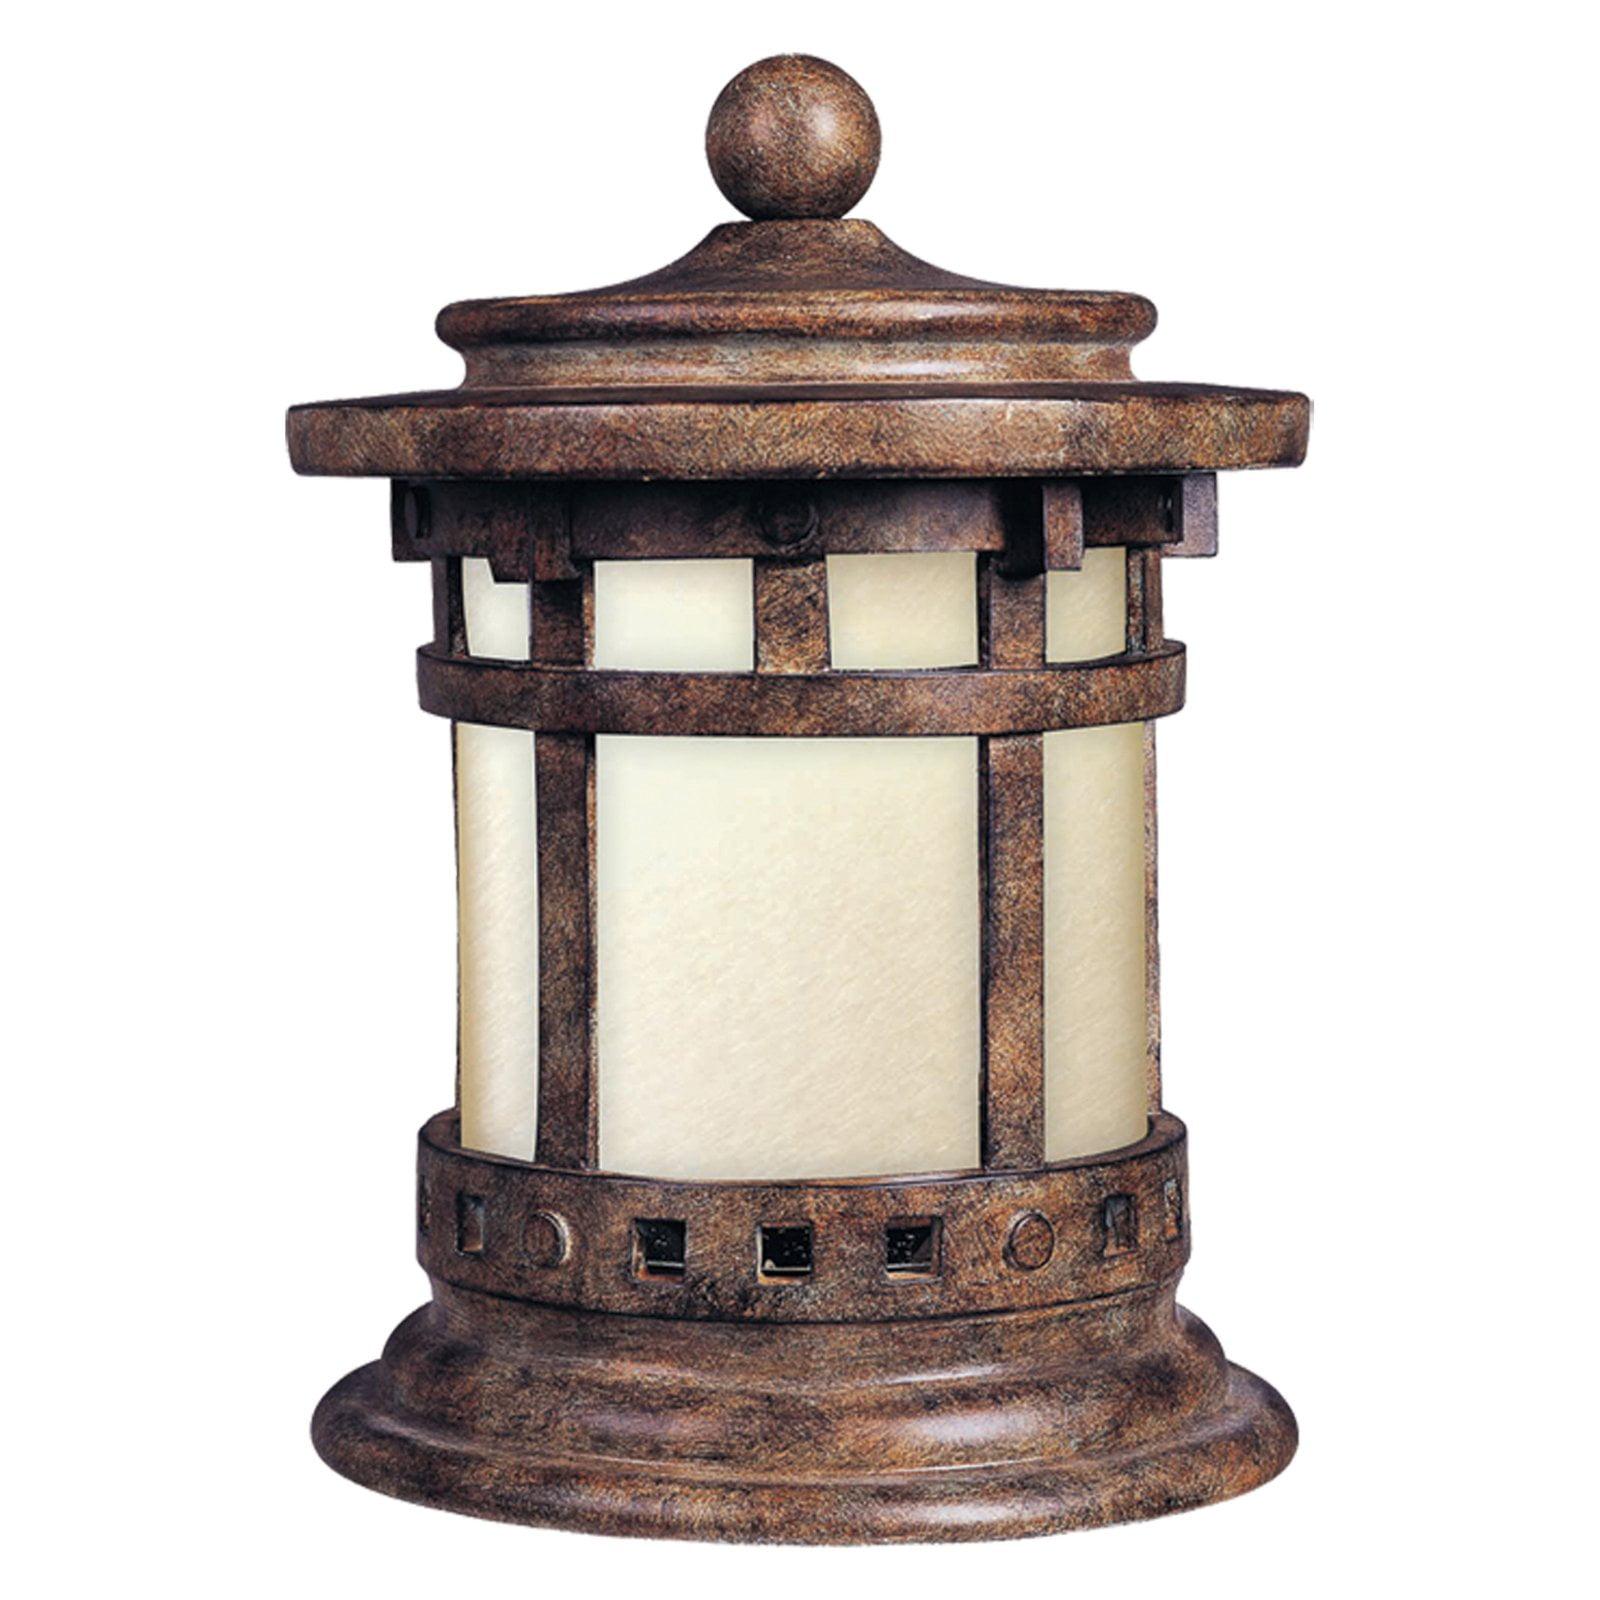 Maxim Santa Barbara 55032MOSE Outdoor Deck Lantern